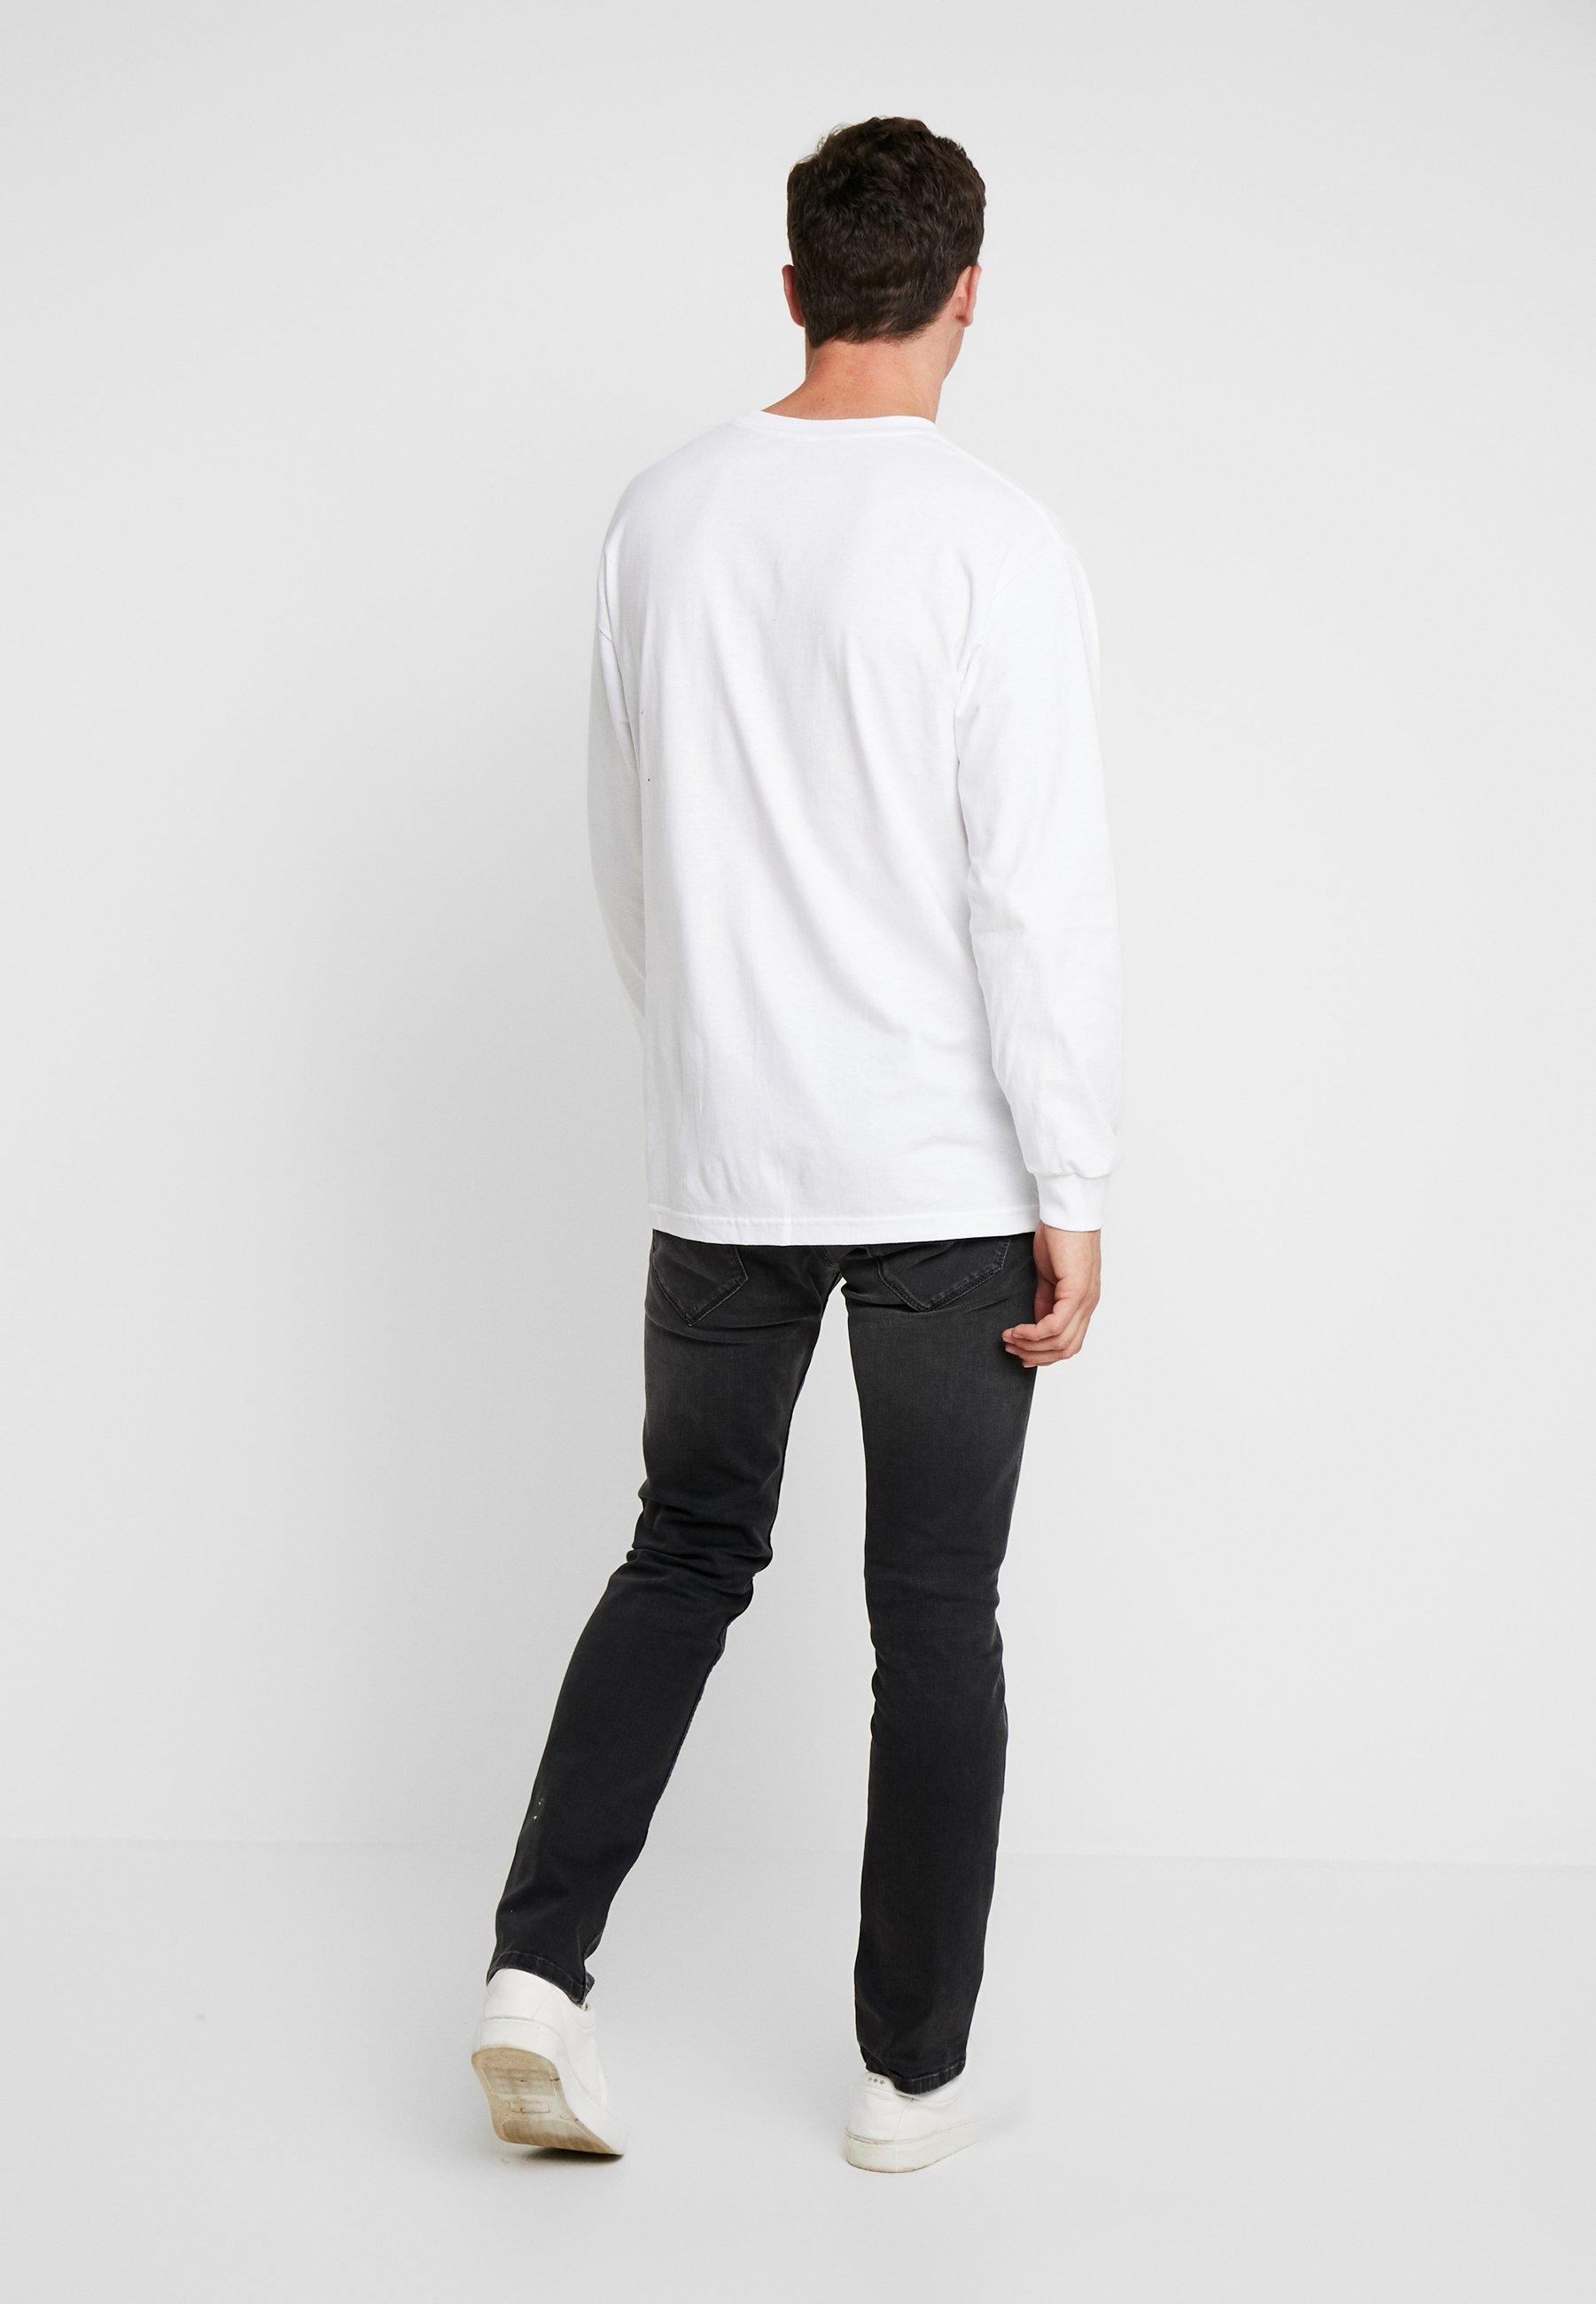 Iso Alennus Miesten vaatteet Sarja dfKJIUp97454sfGHYHD Pepe Jeans SPIKE Straight leg -farkut black denim